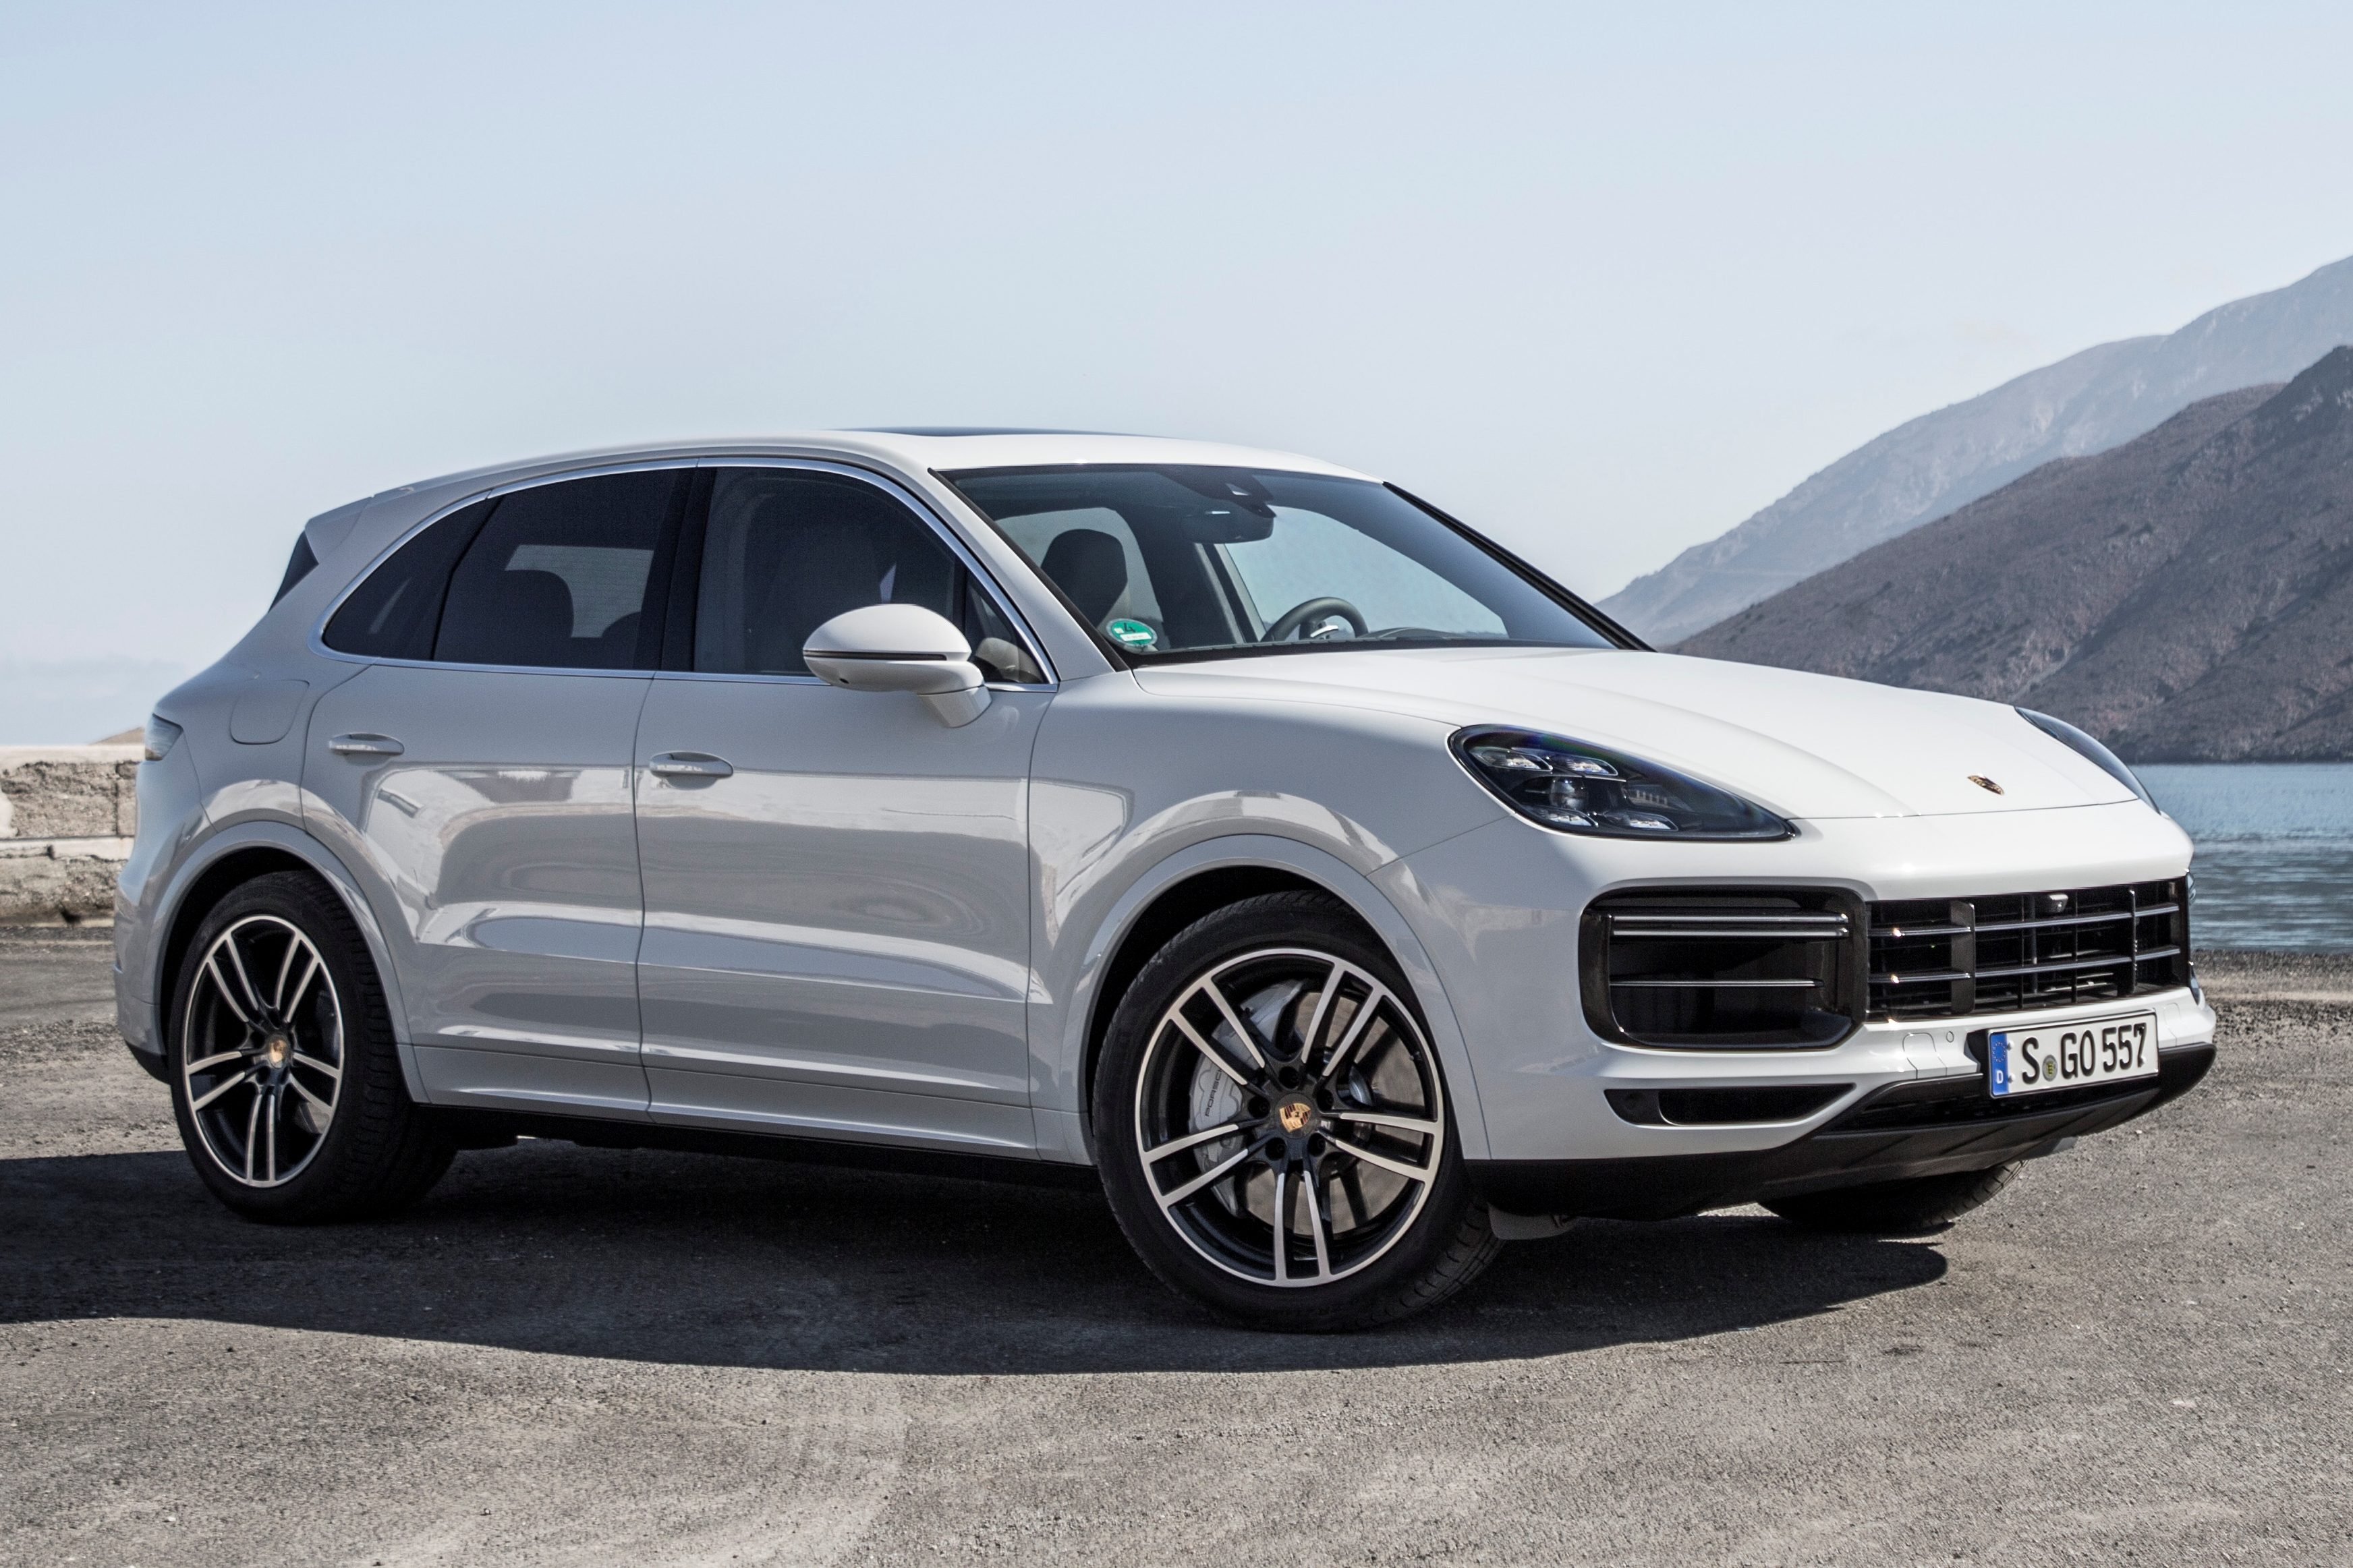 Subtly tweaked looks hide serious technical work under the new Porsche Cayenne's skin.